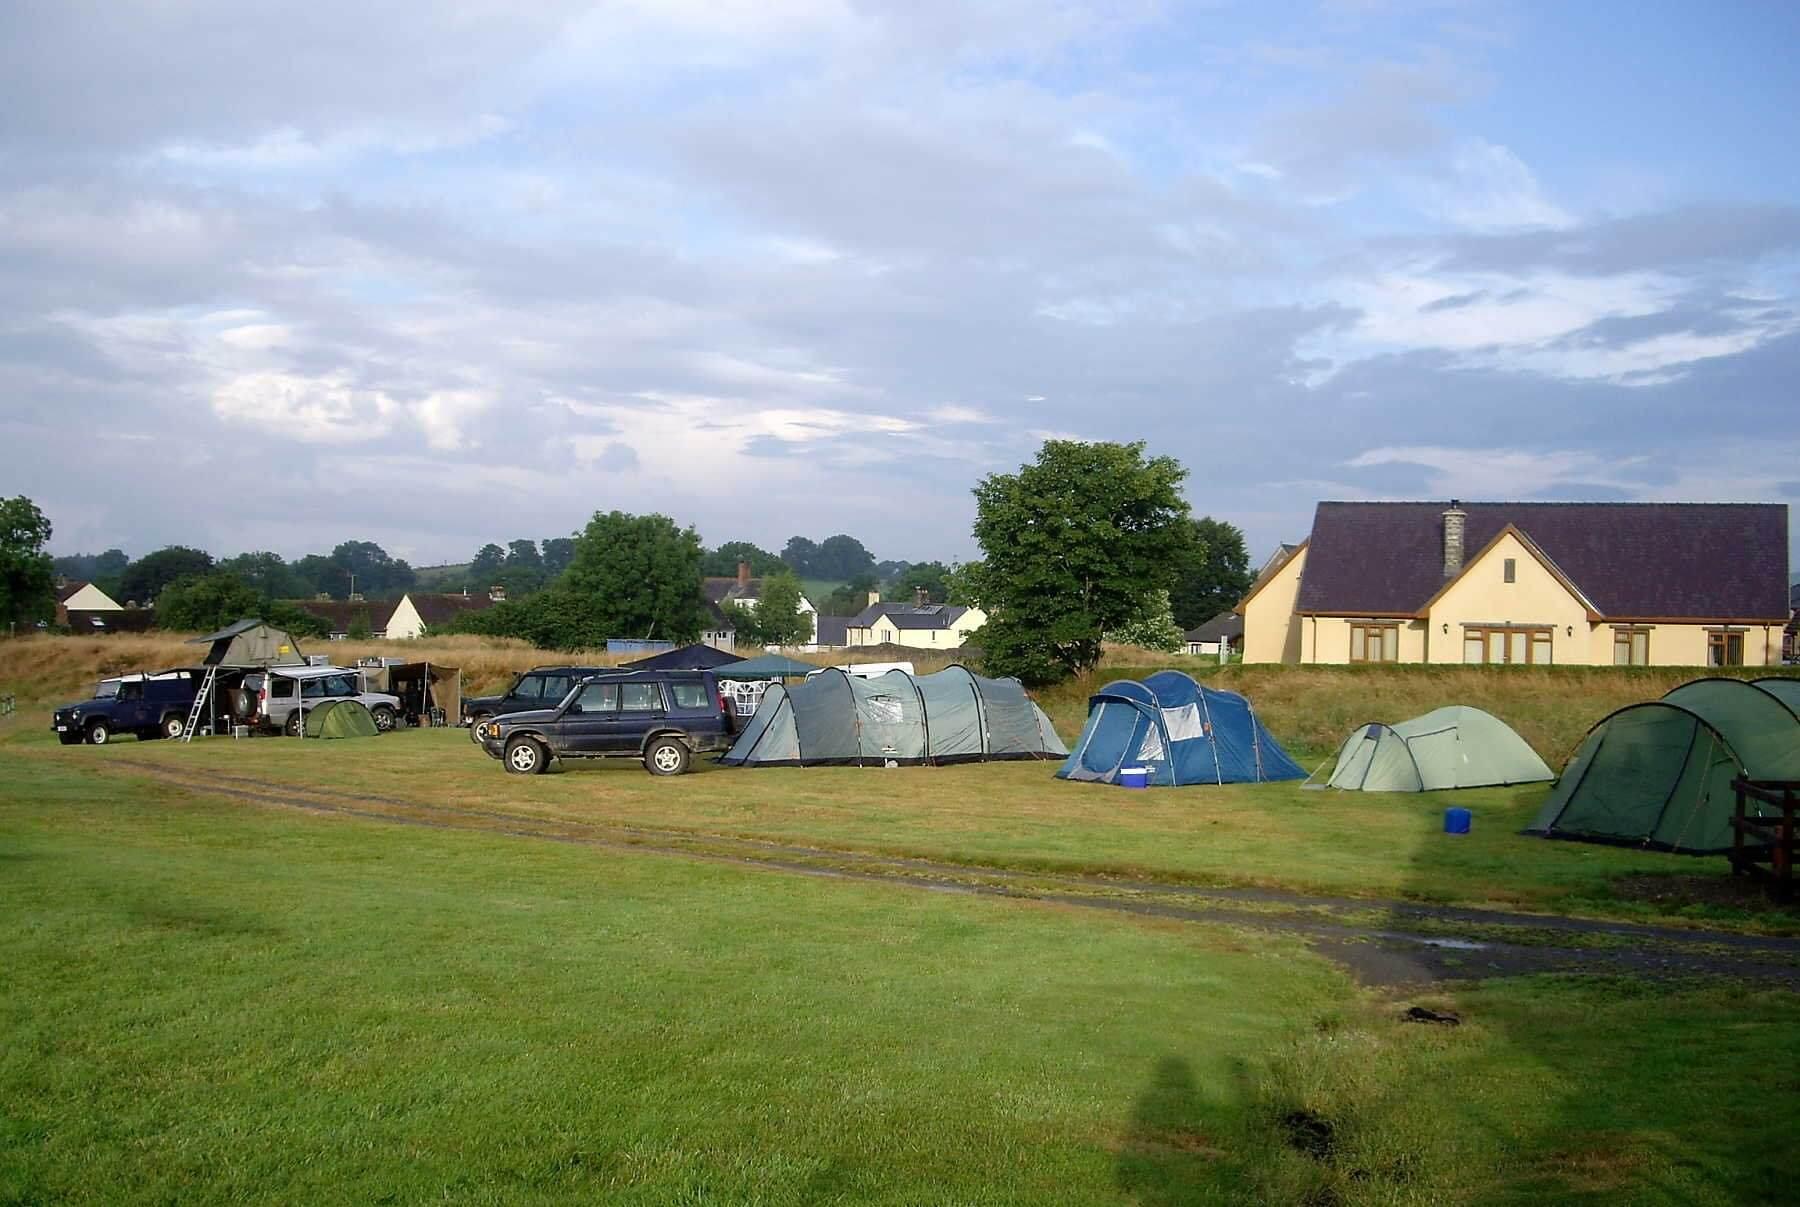 Nantyrhelyg Camping